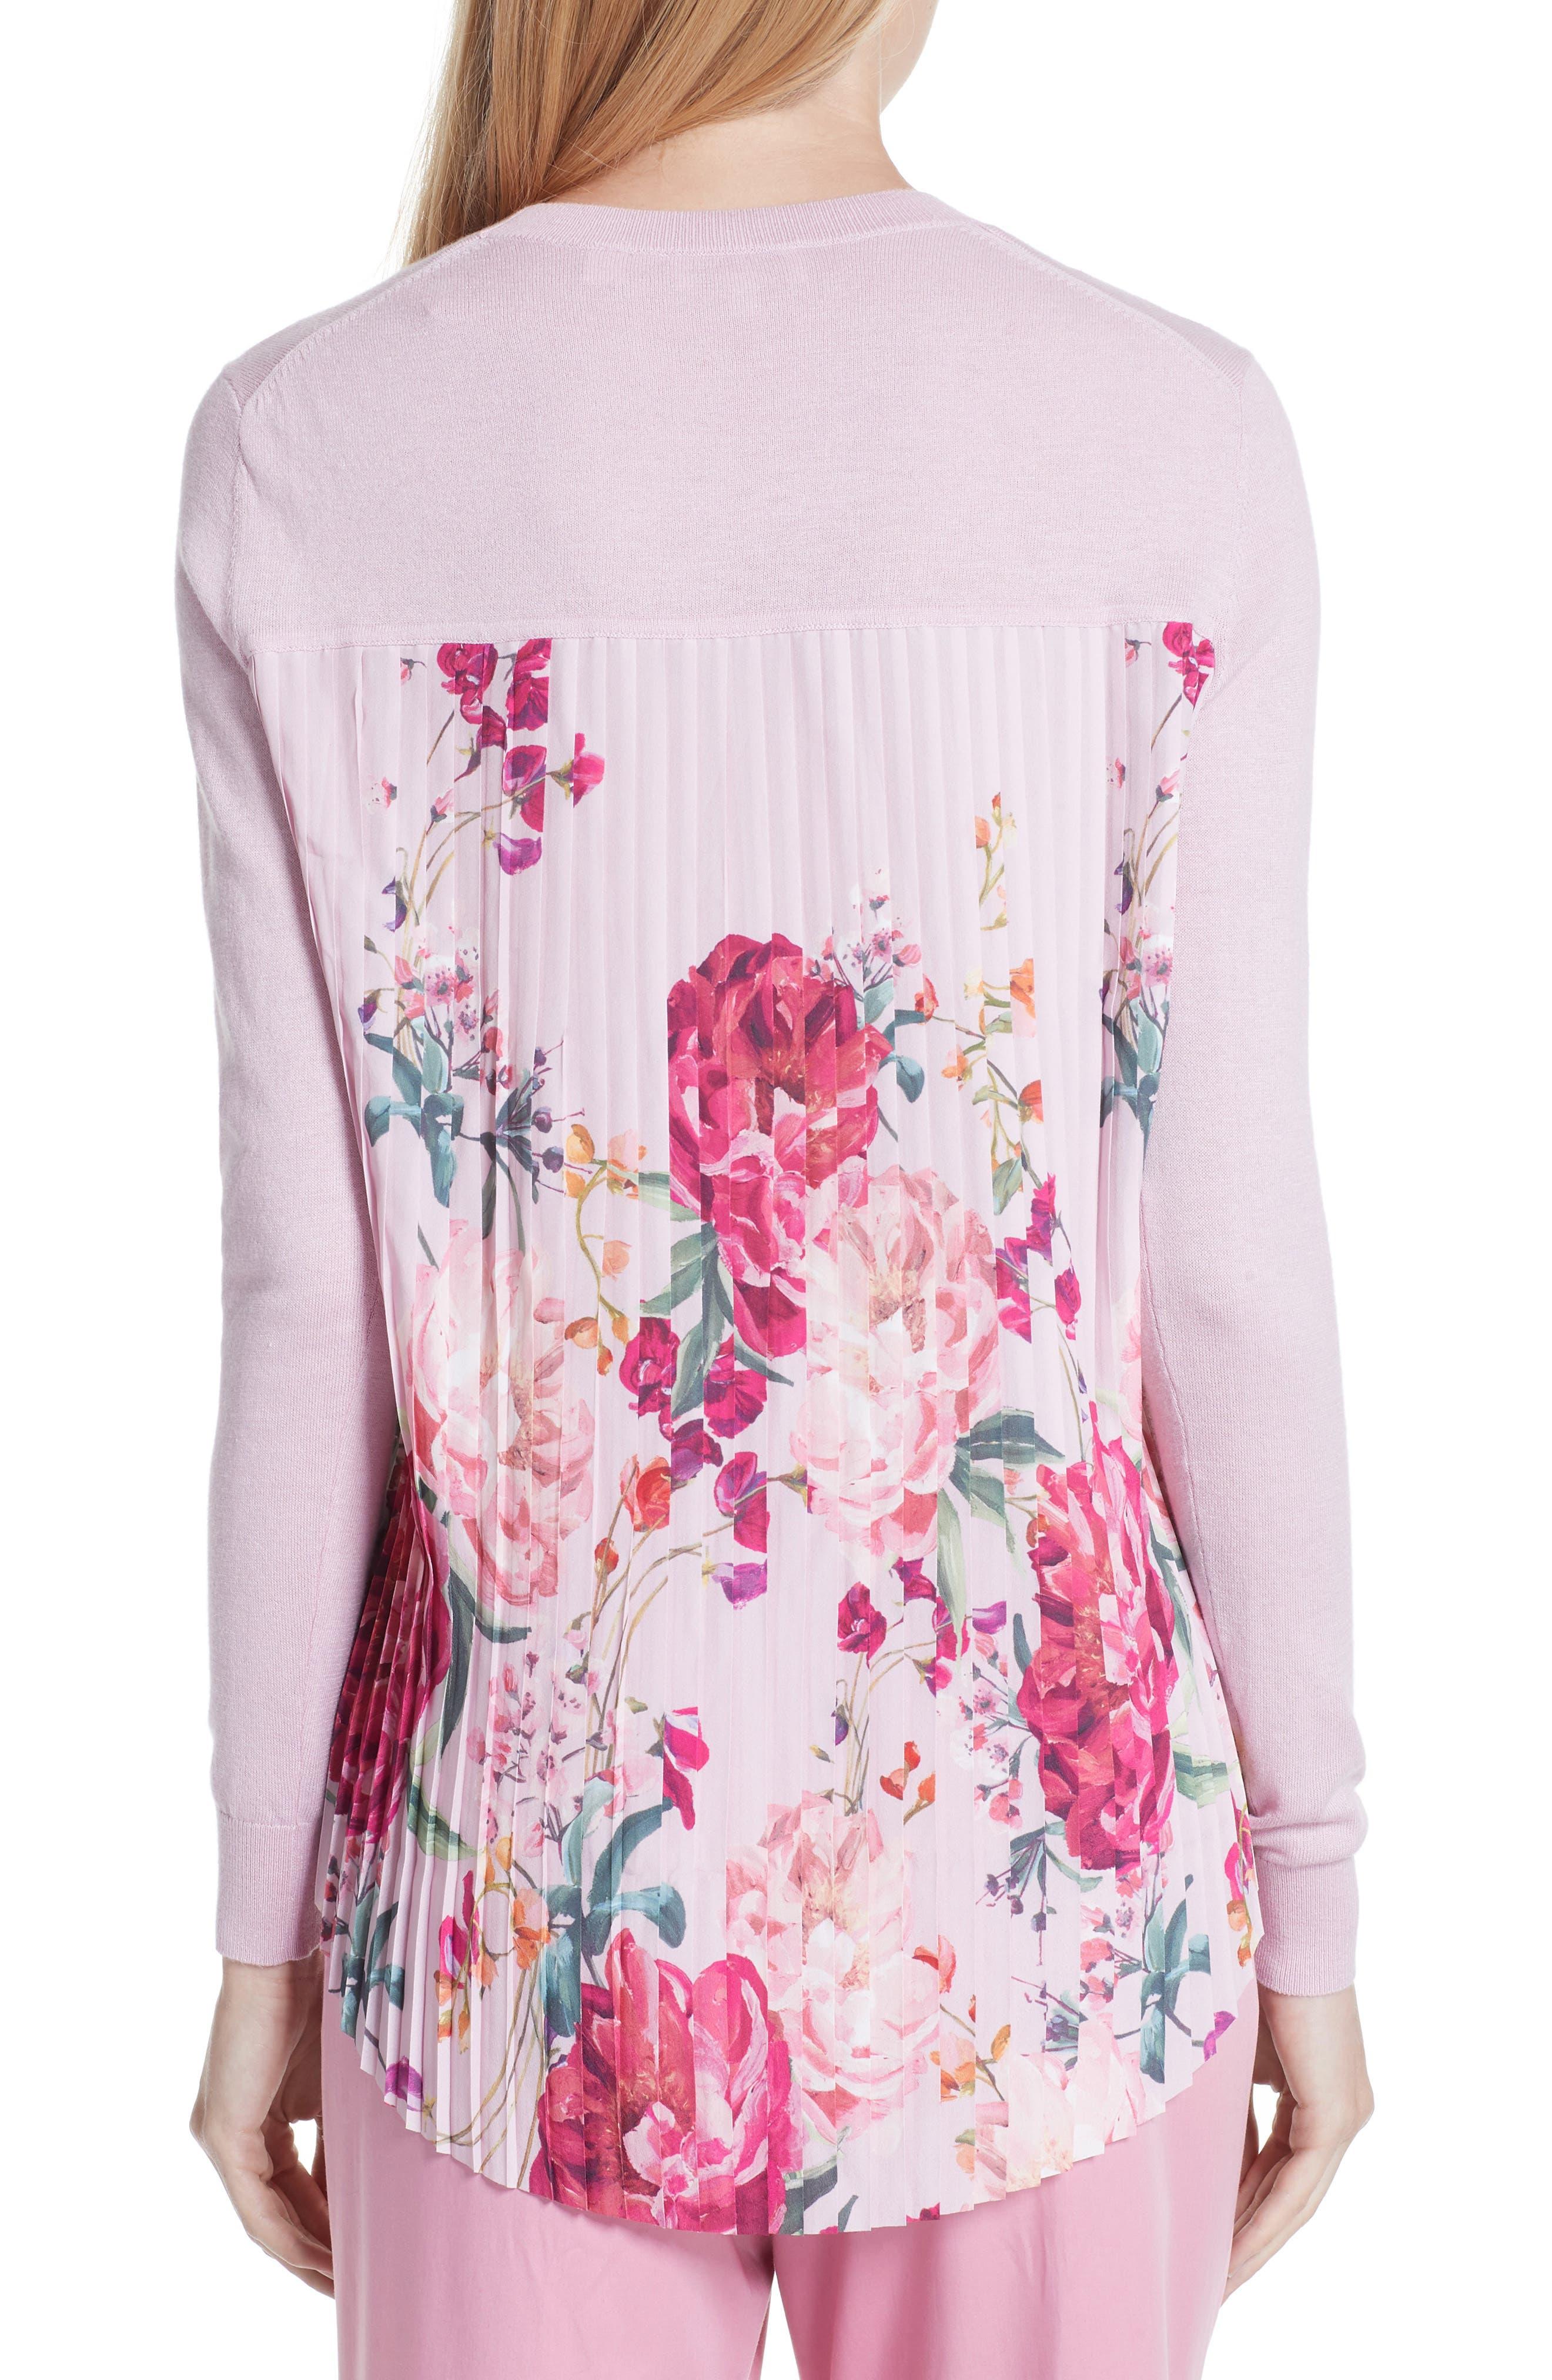 Kaleese Serenity Pleat Back Silk Cotton Sweater,                             Alternate thumbnail 2, color,                             531